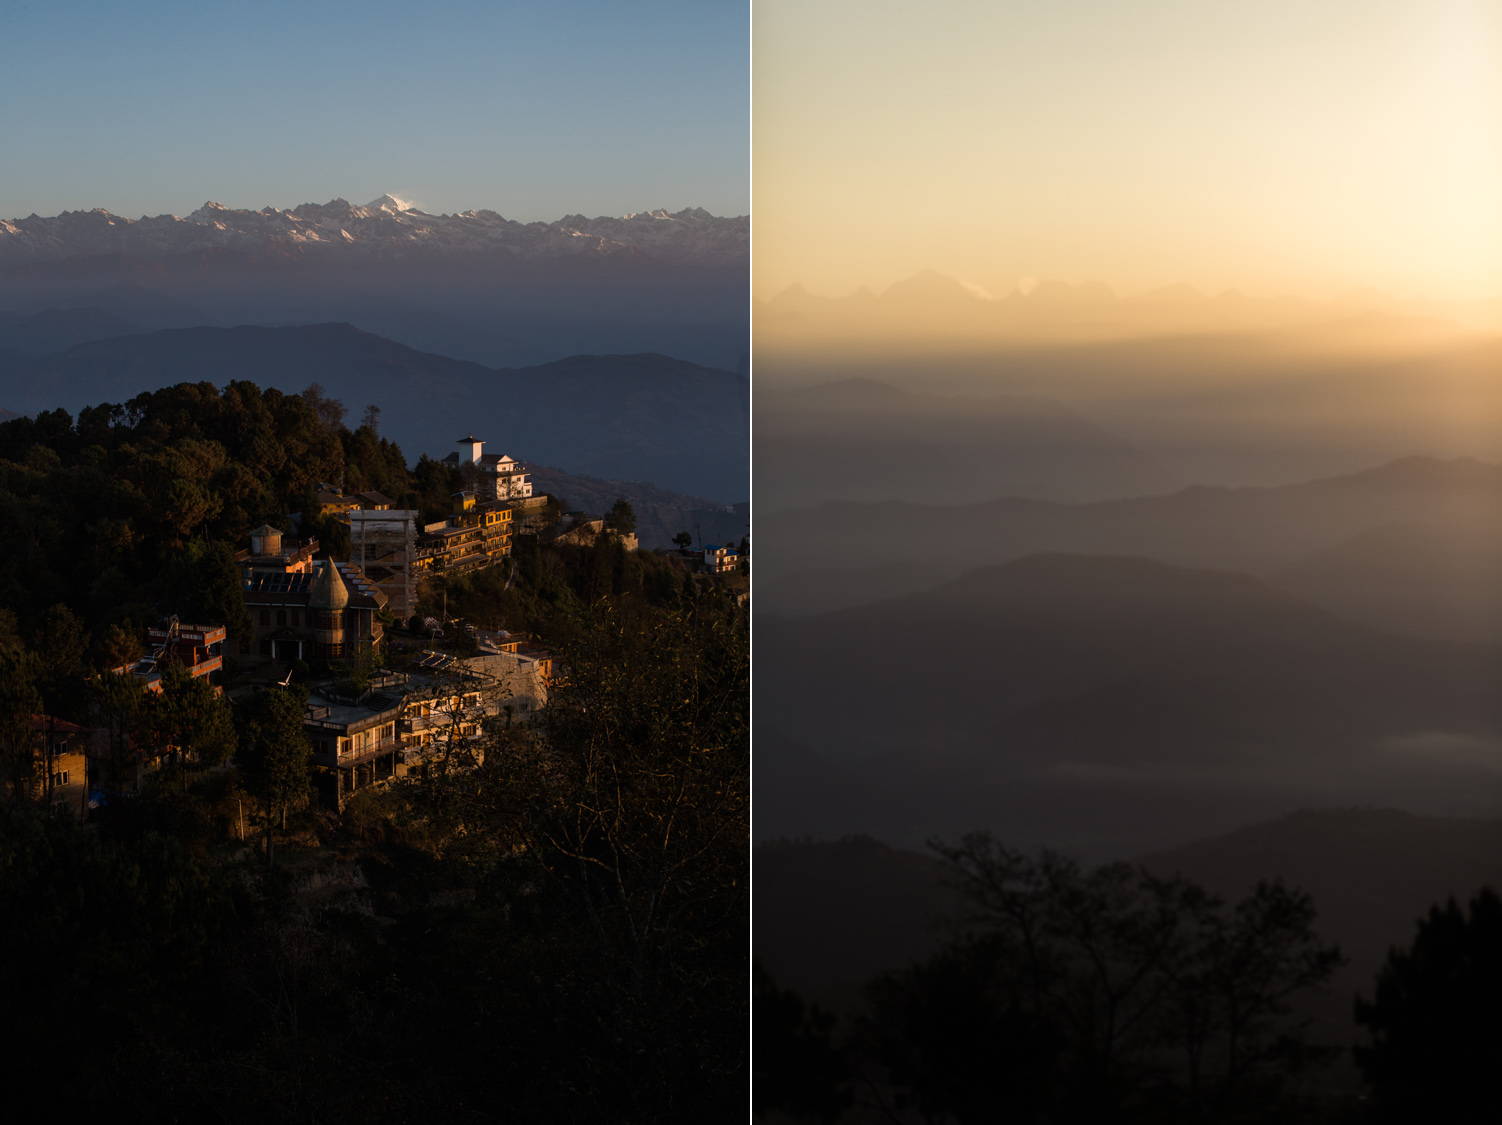 webakp-nepal-2025.jpg